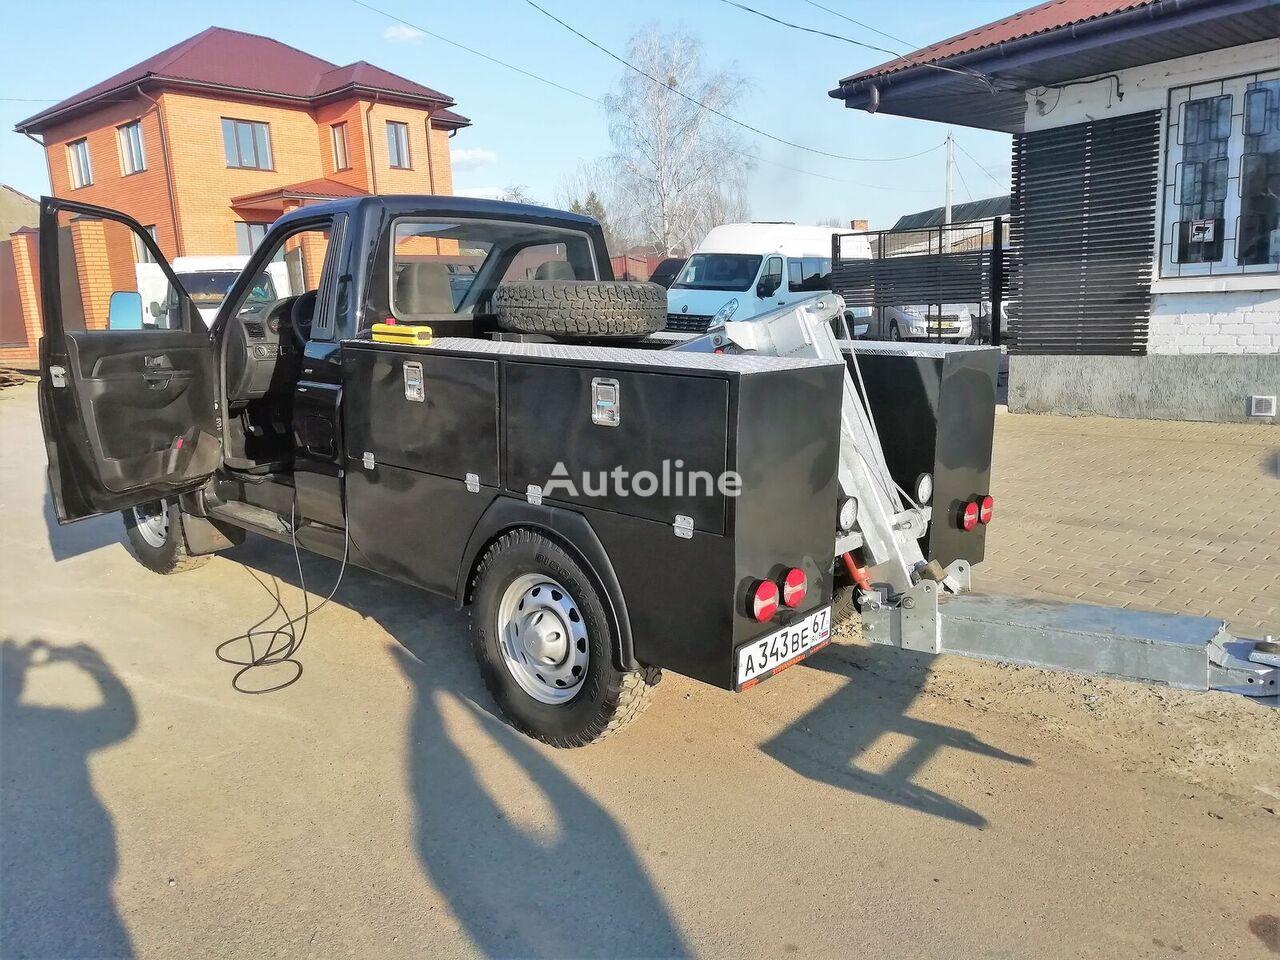 UAZ Kargo tow truck